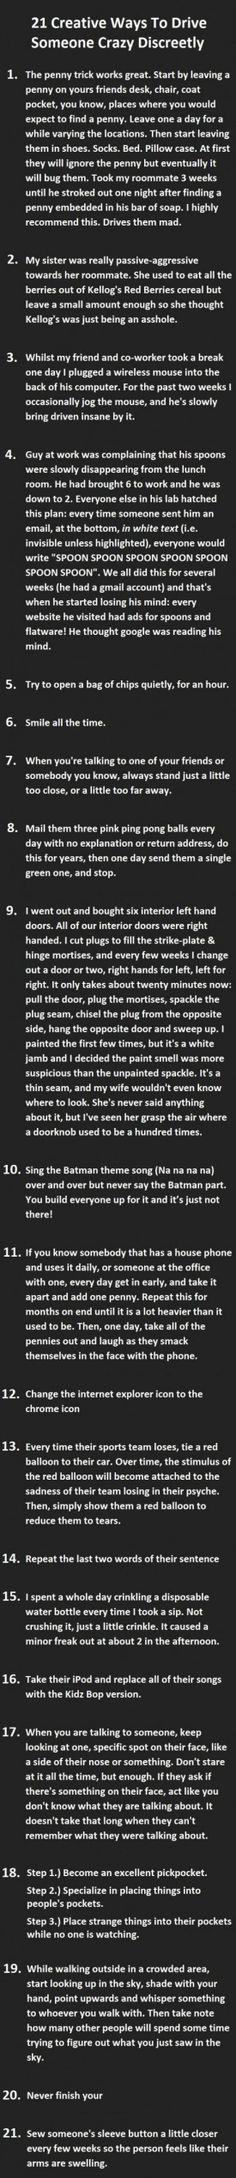 Thanks Satan... (Number 5 was my favorite)